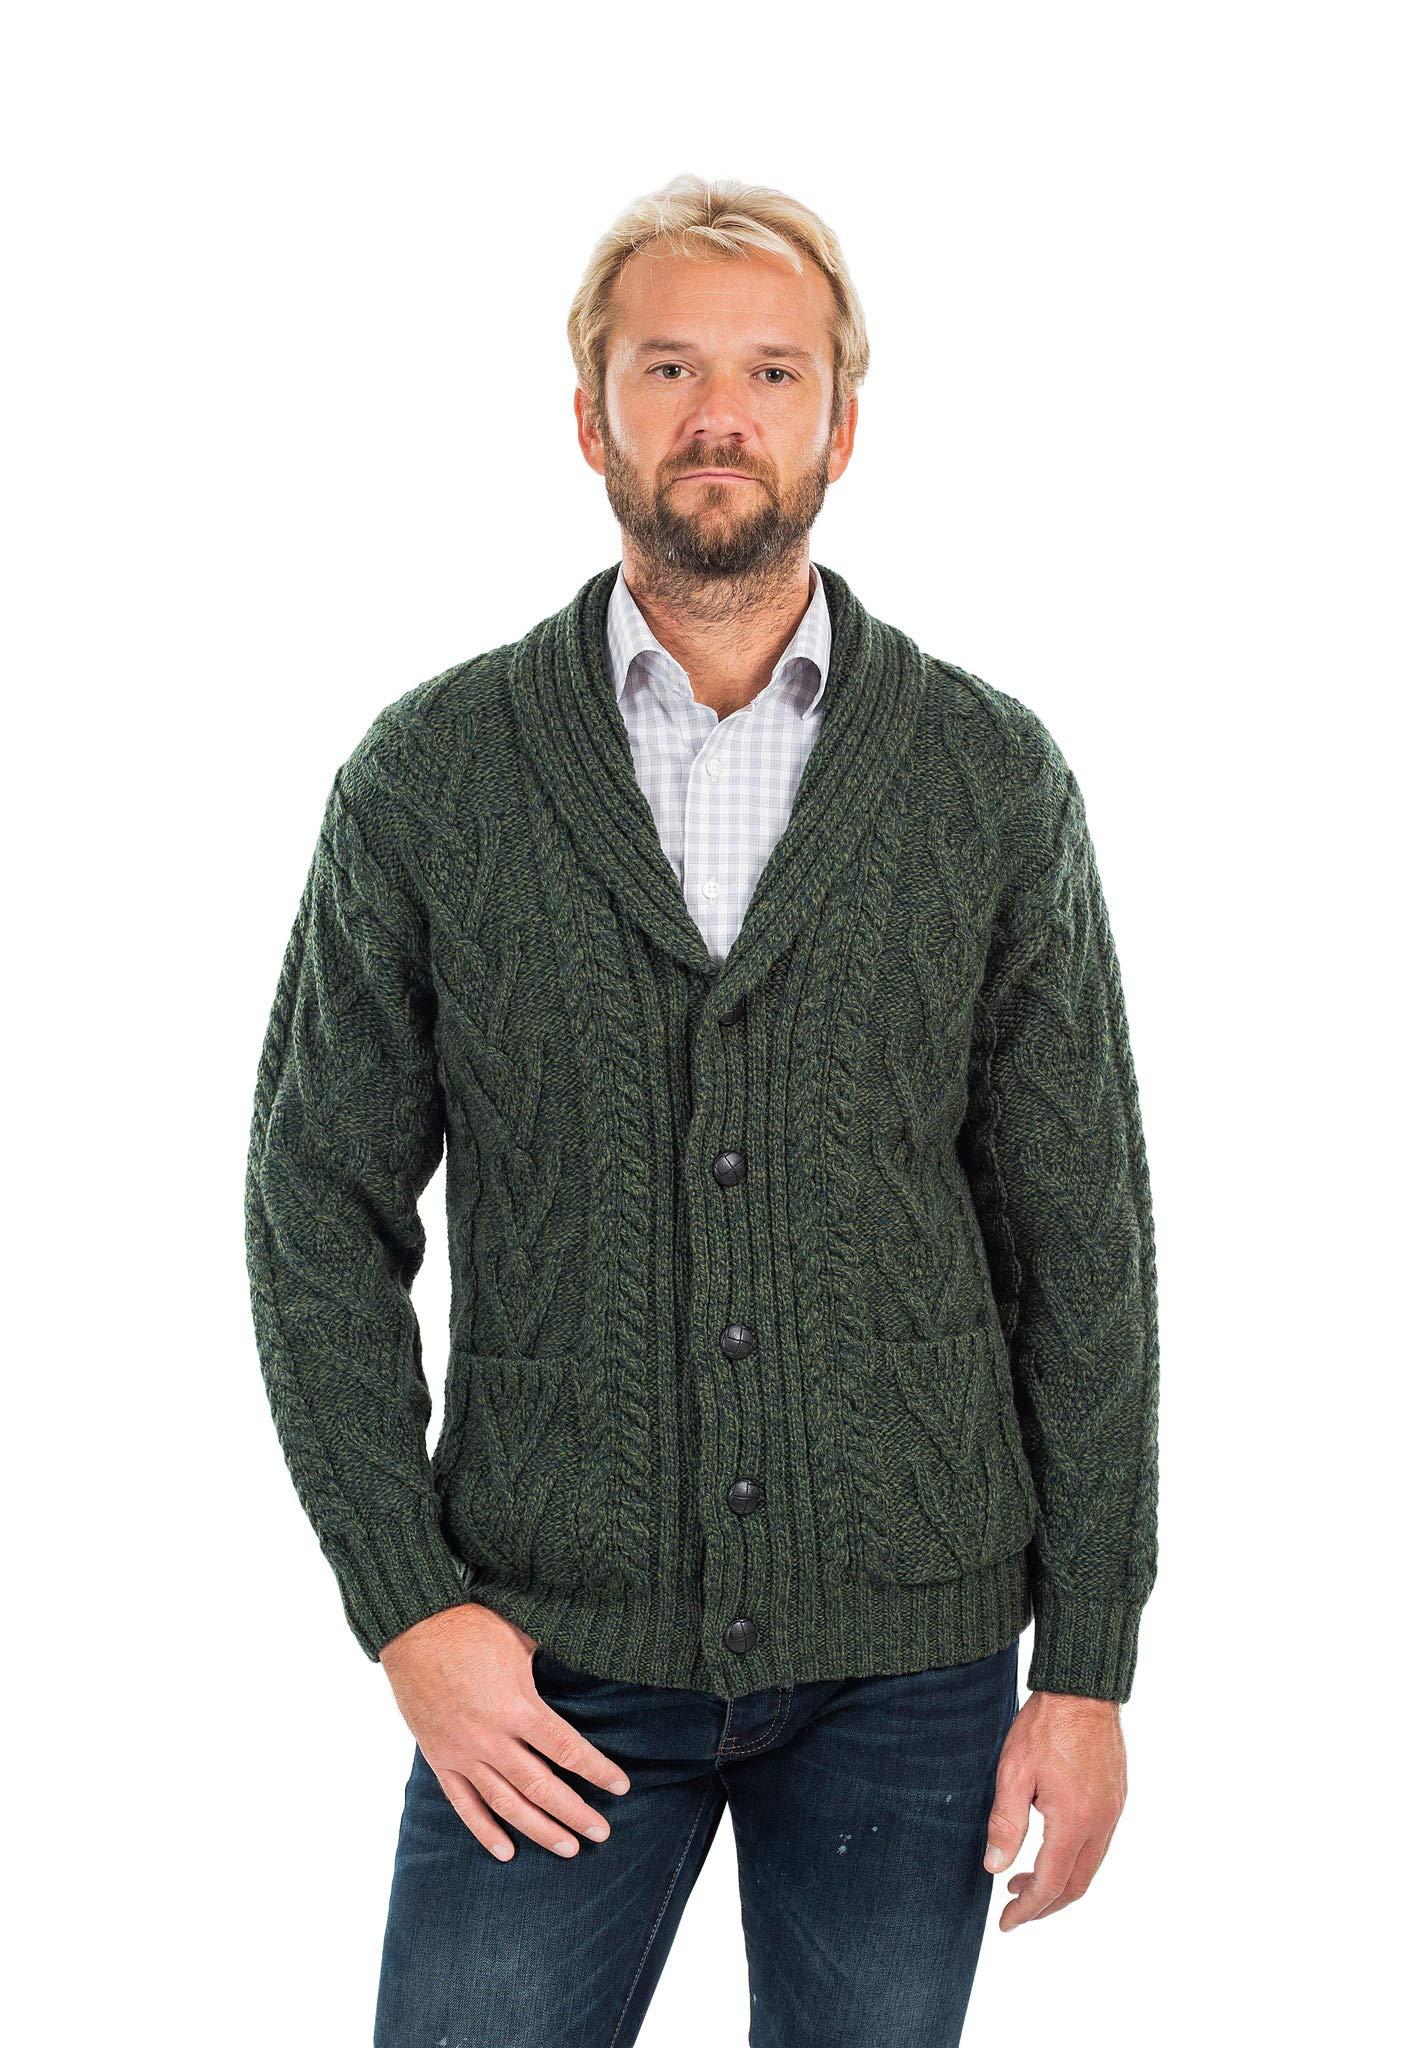 Mens Aran Cable Shawl-Collar Cardigan (Army Green, XXXLarge)